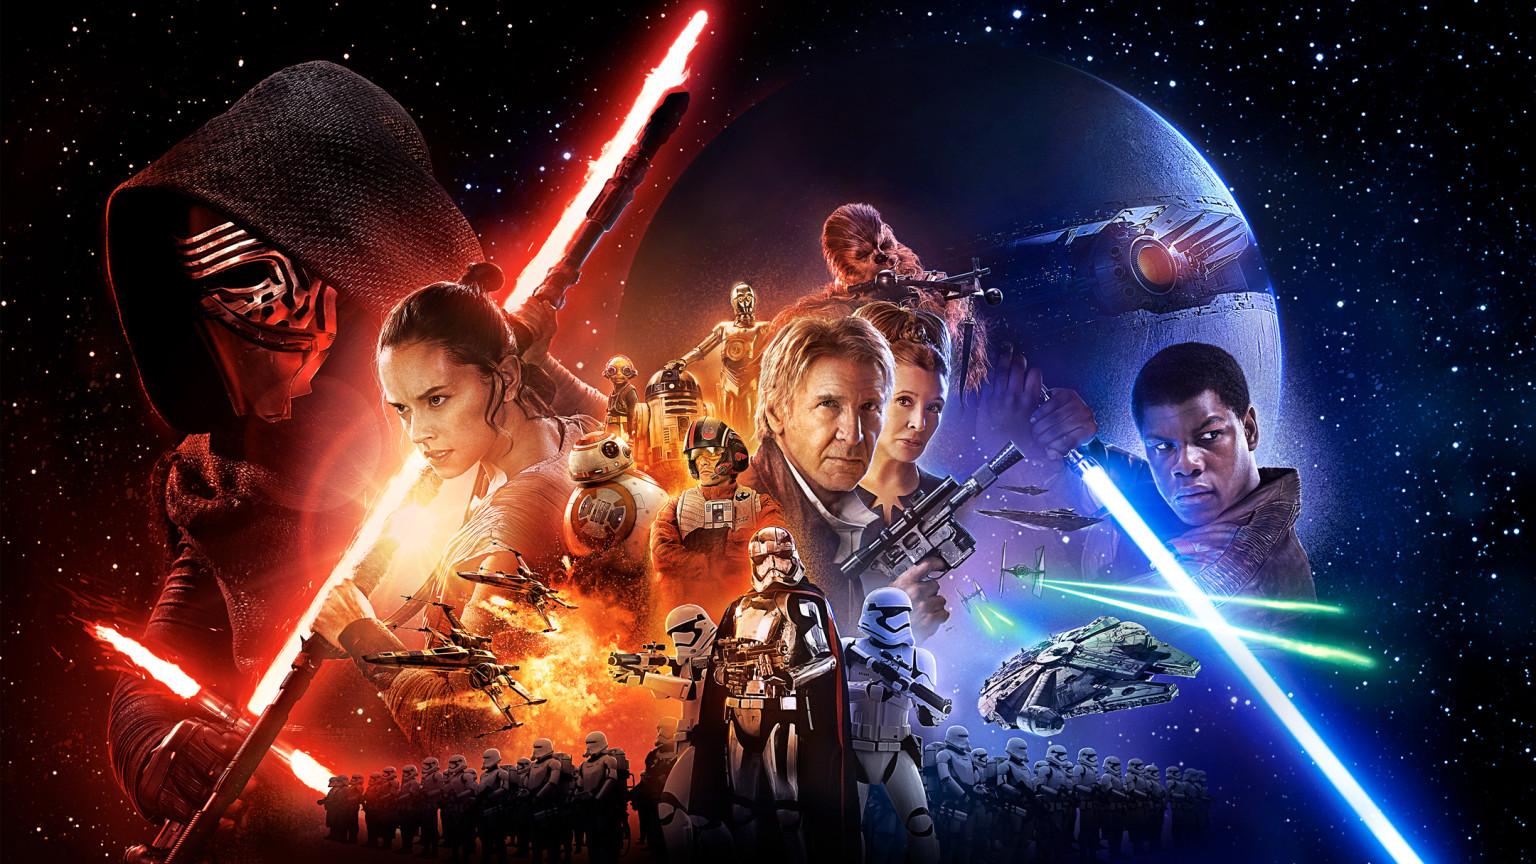 Star Wars Especial Star Wars Liderou Audiência Do Cabo